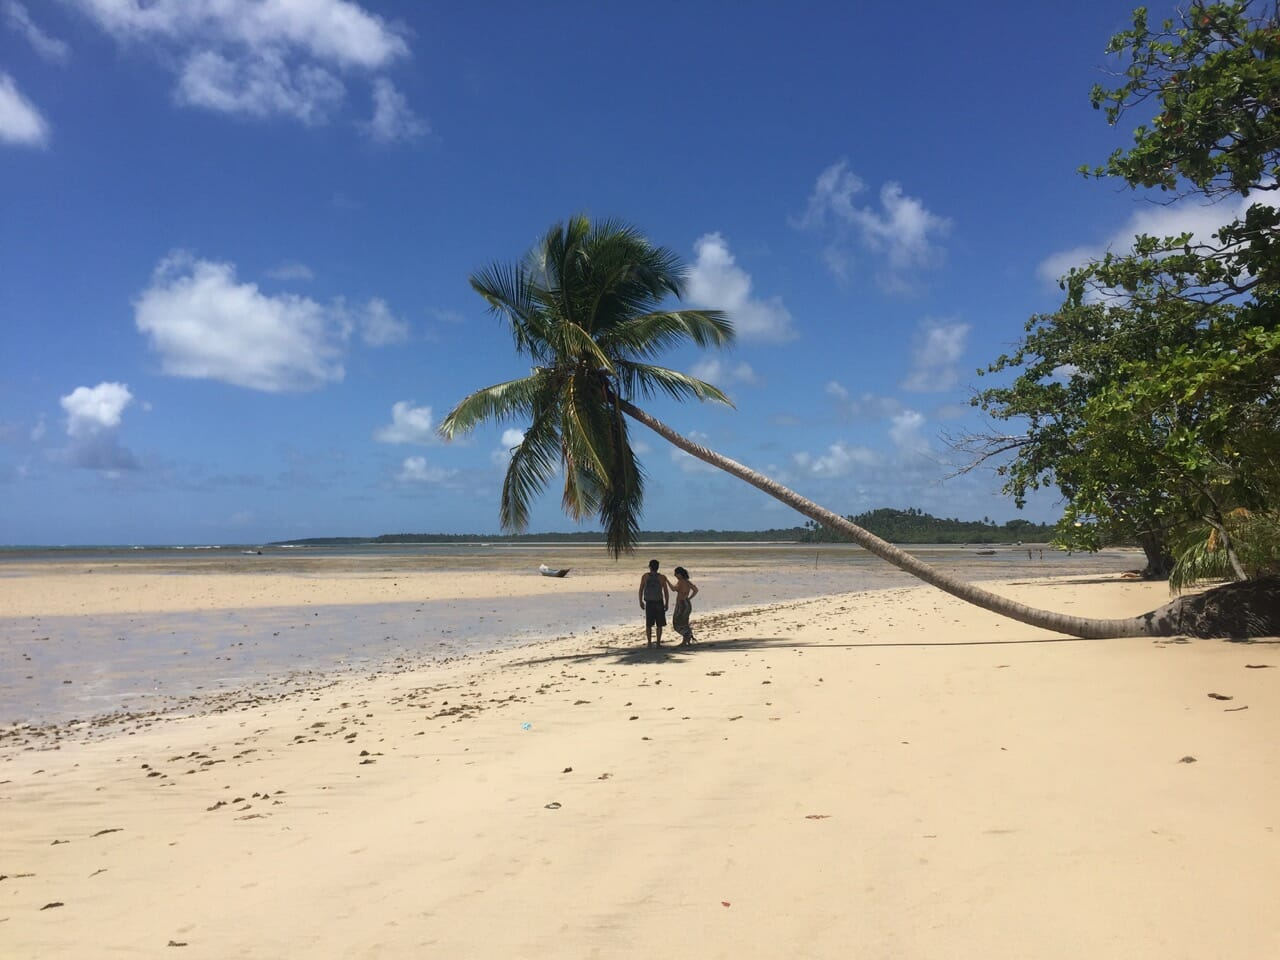 mejores playas de Bahia Hoteles en Boipeba